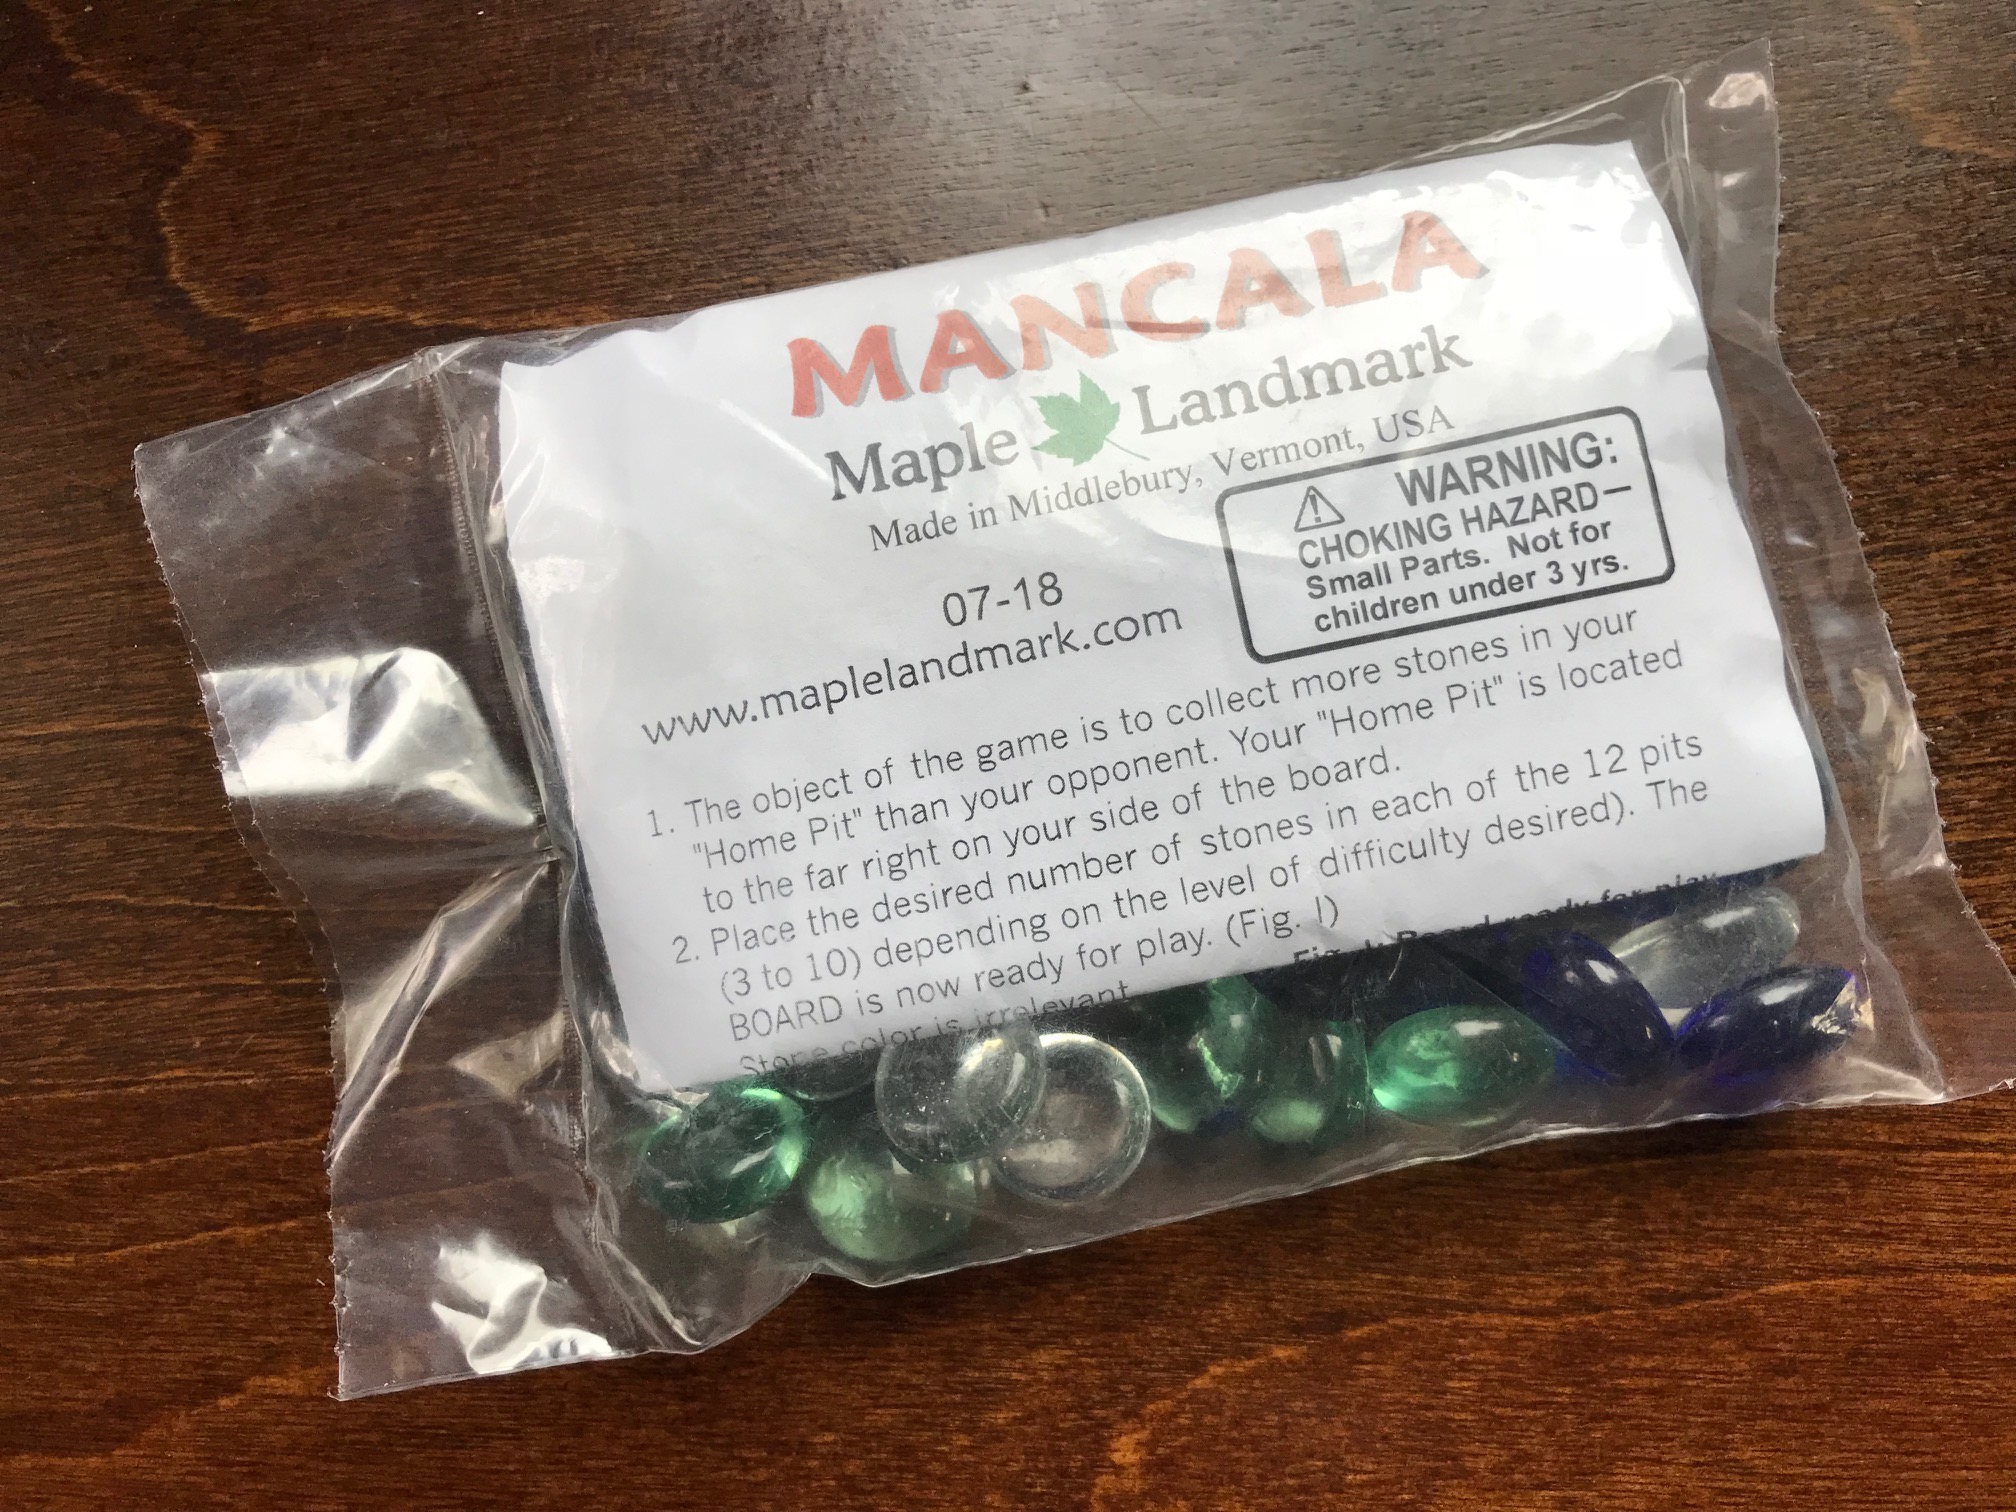 #AskTamara: Do Glass Dragon Tears Have Lead? (Aka: Squashed Marbles, Glass Drops or Mancala Stones?)